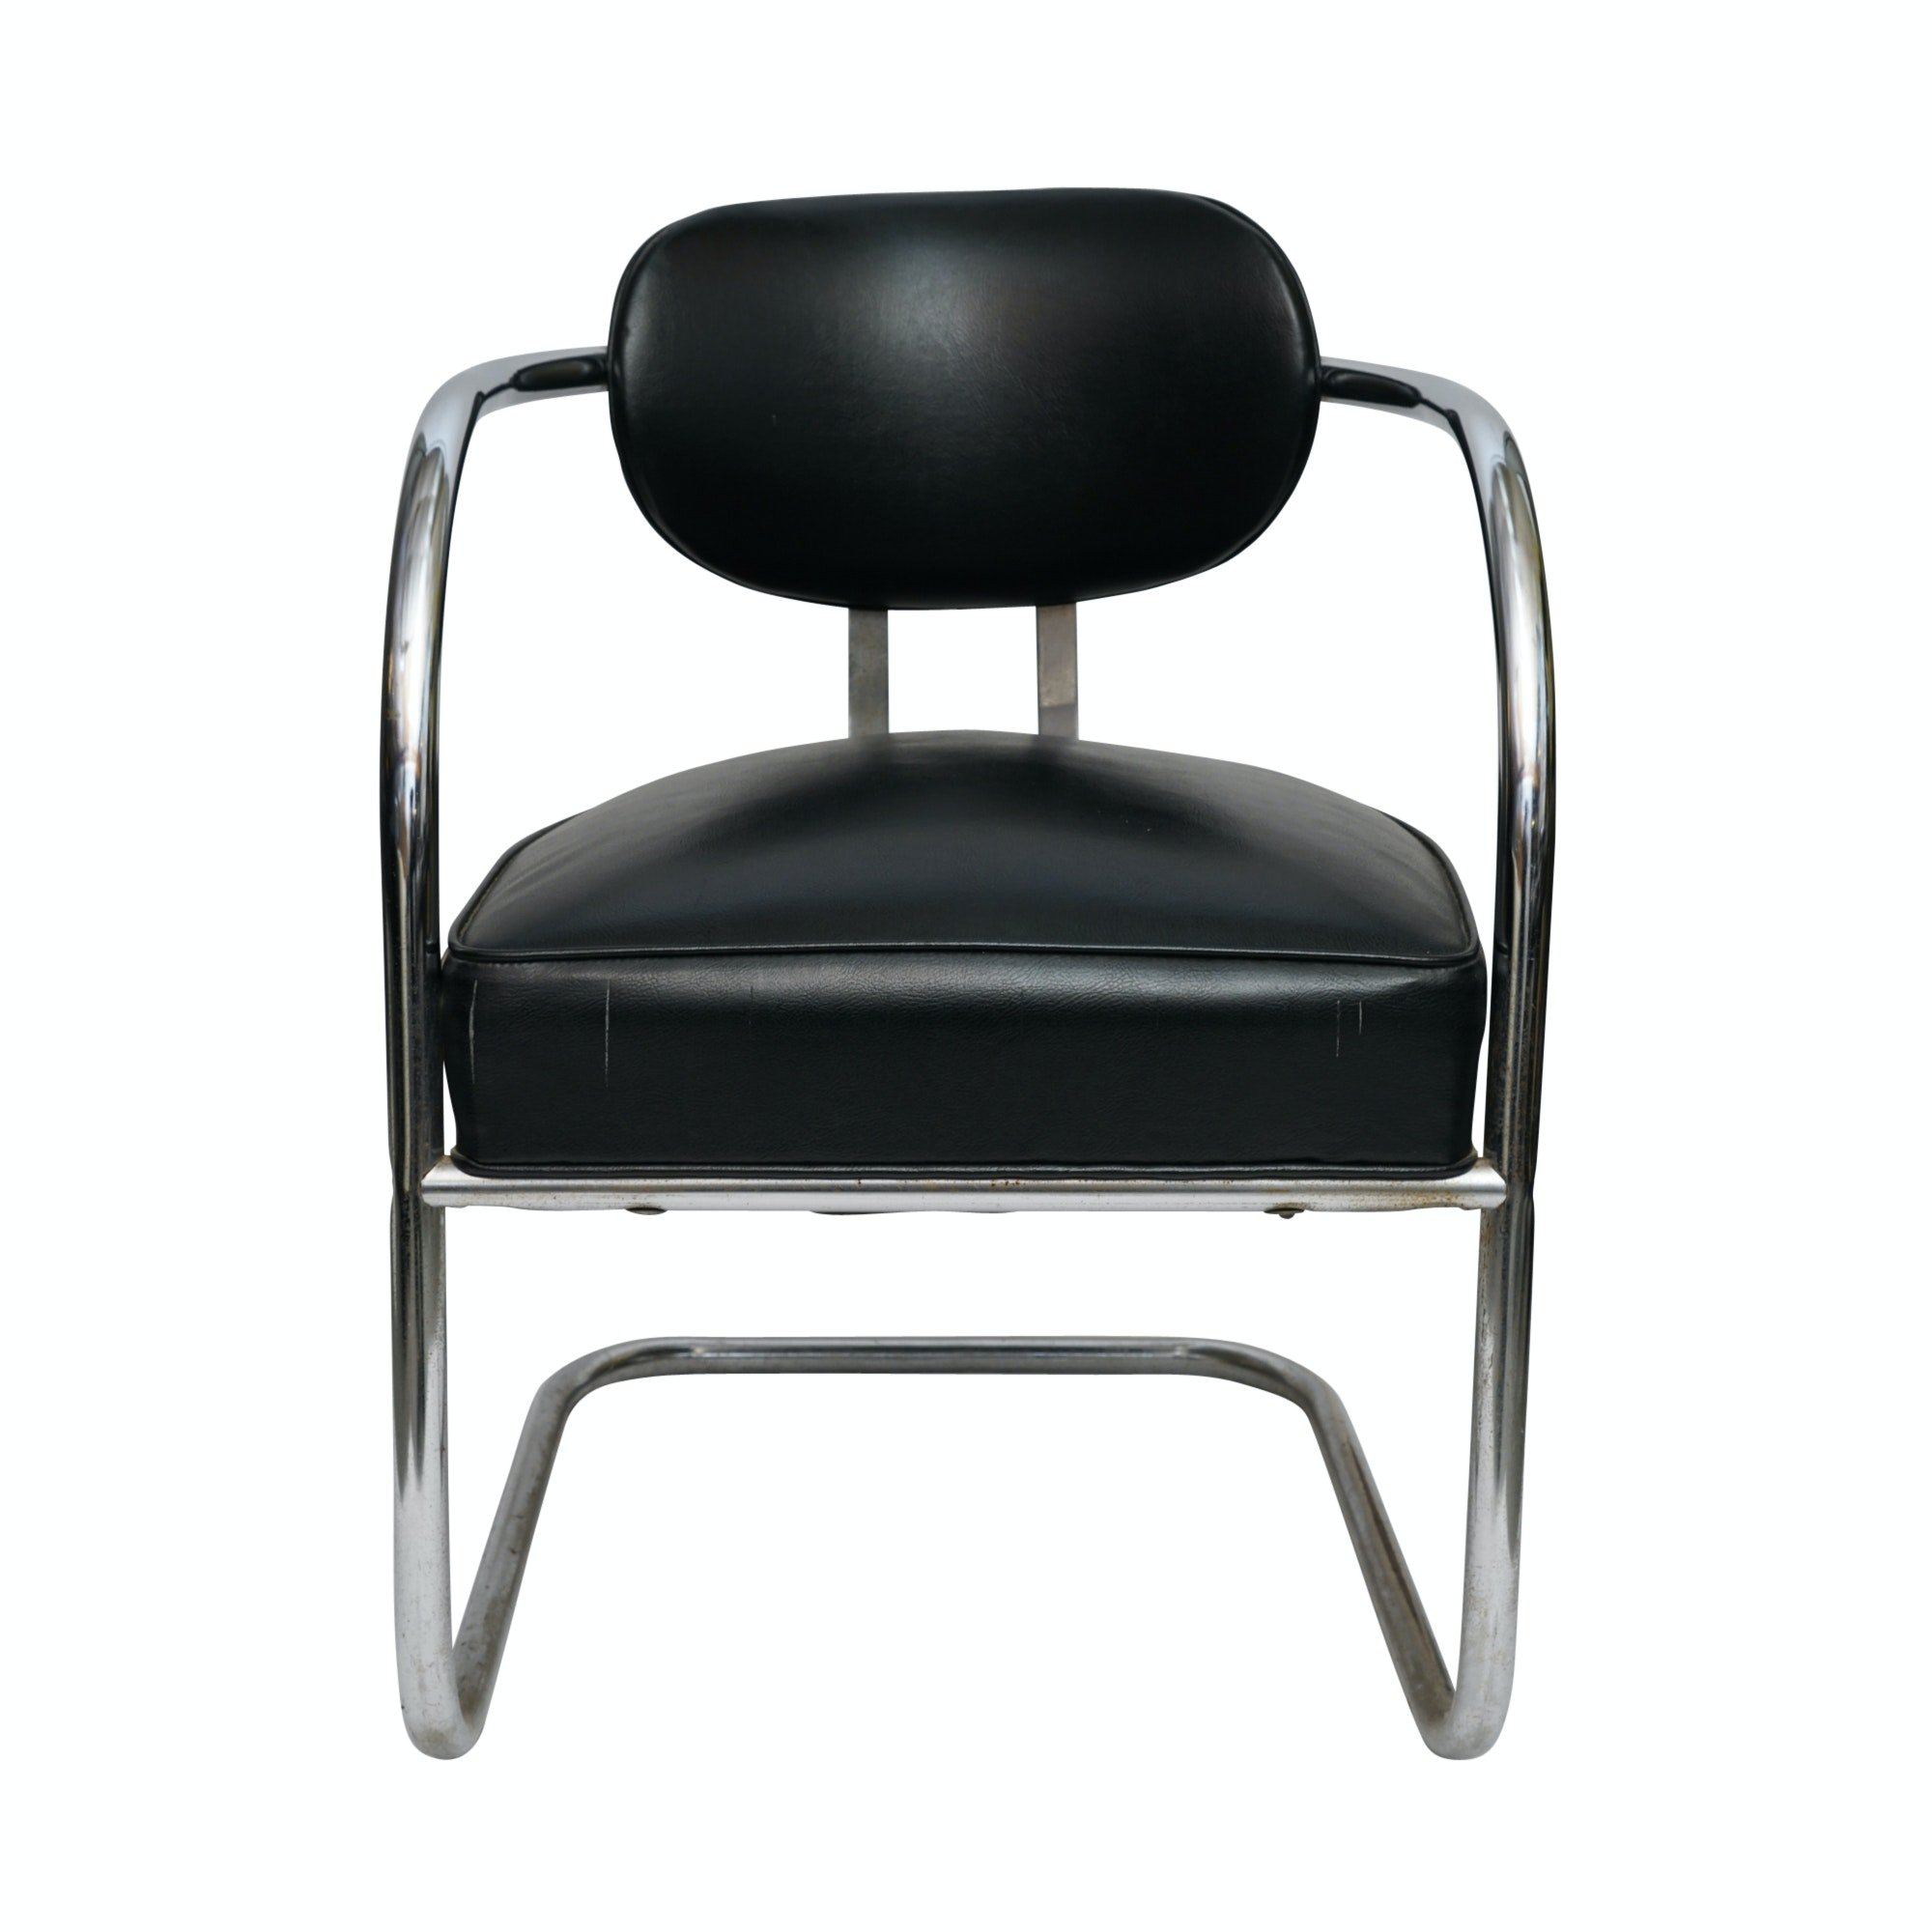 Art Deco Chromed Metal Cantilevered Armchair